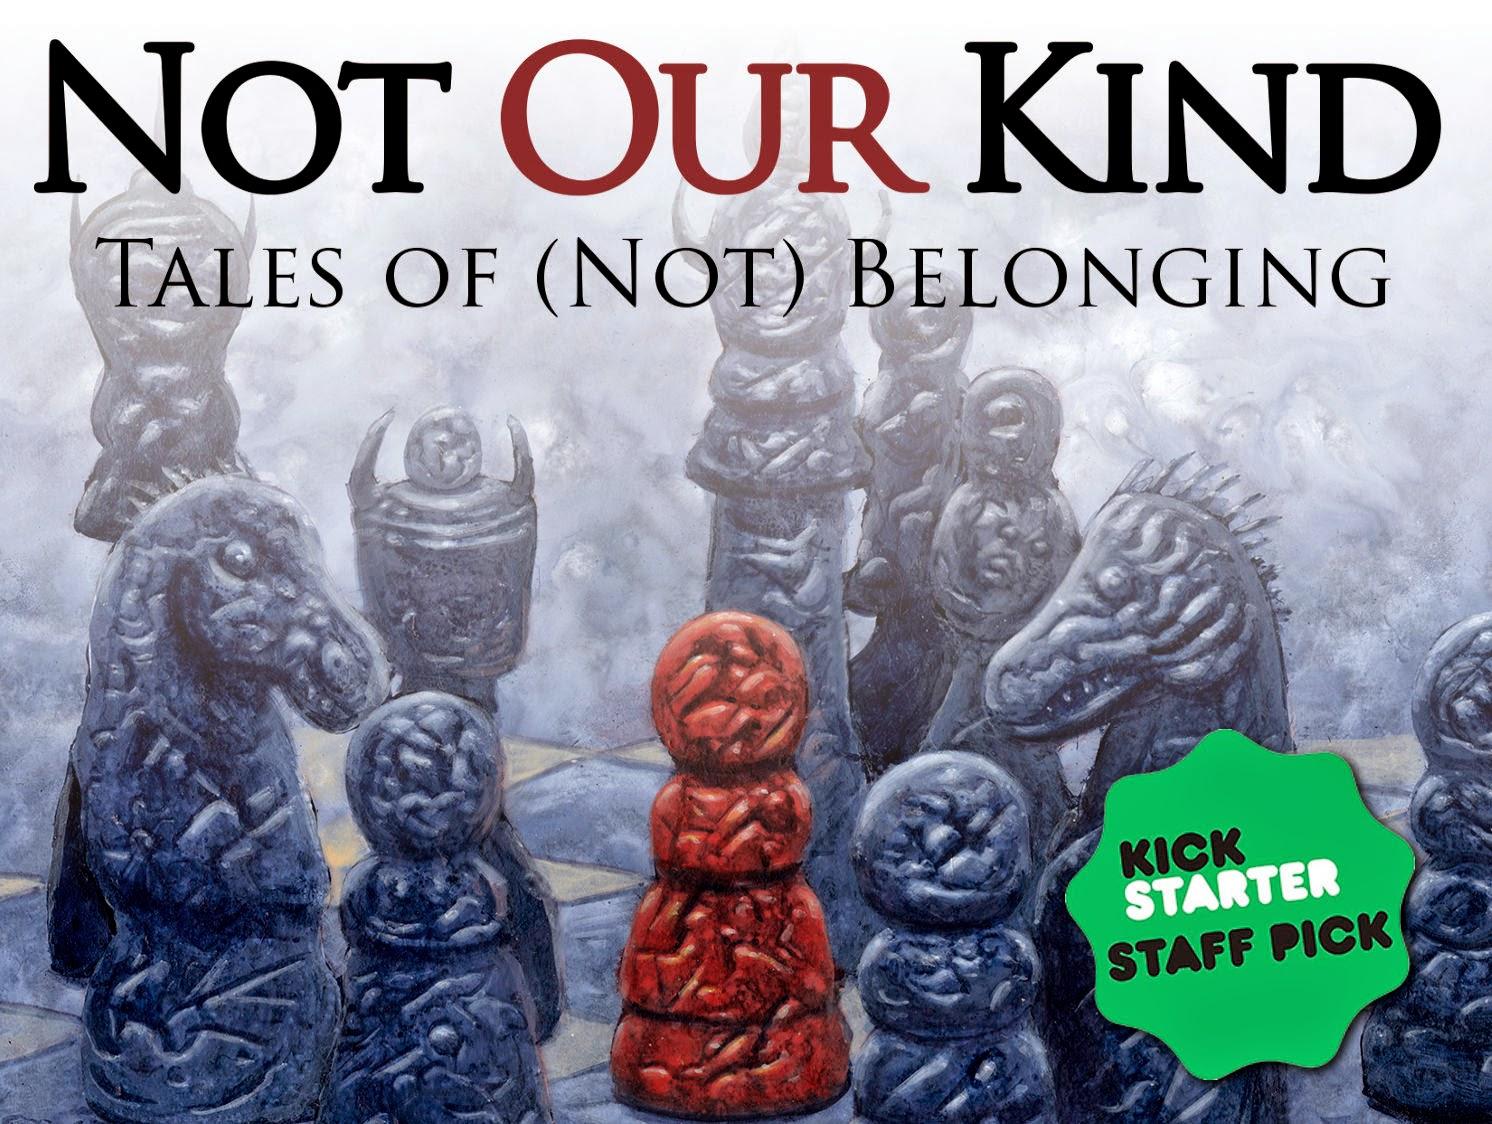 http://bit.ly/kicknotourkind